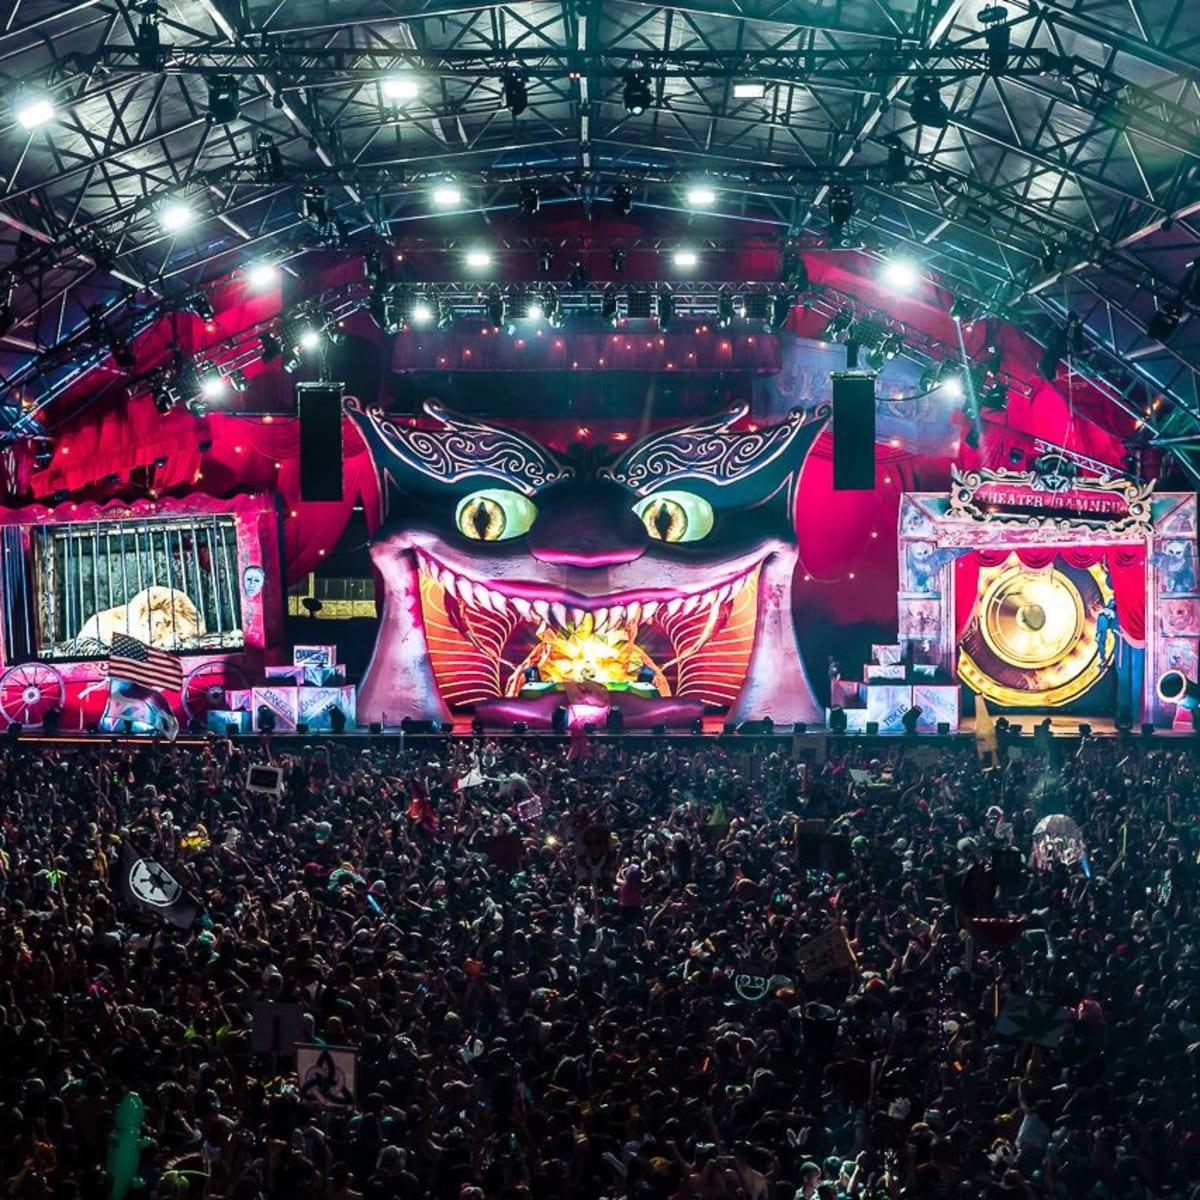 Escape Halloween 2020 News Insomniac Announces Escape: Psycho Circus 2020   EDM.  The